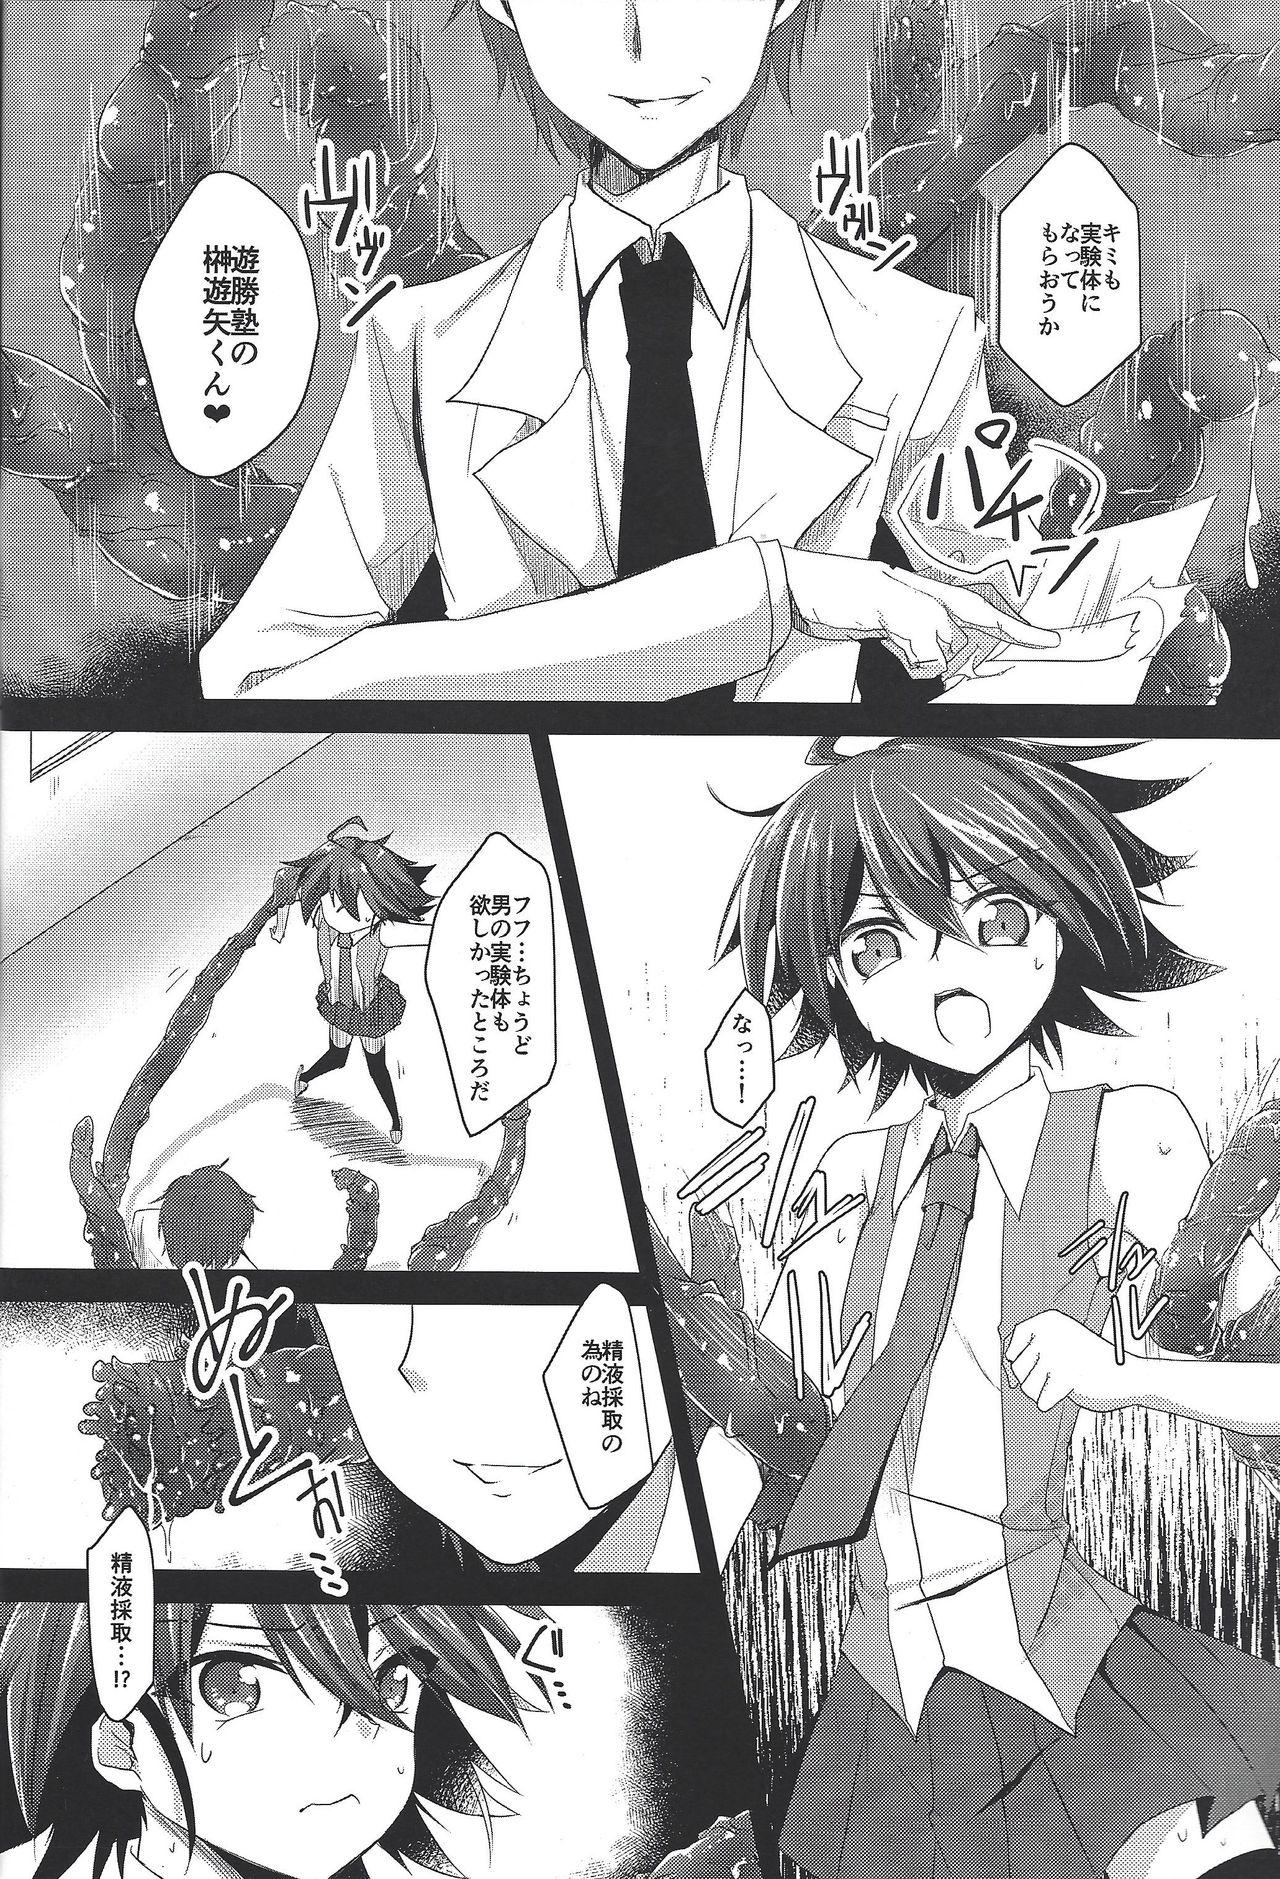 Kyousei Seieki Sakushu 4